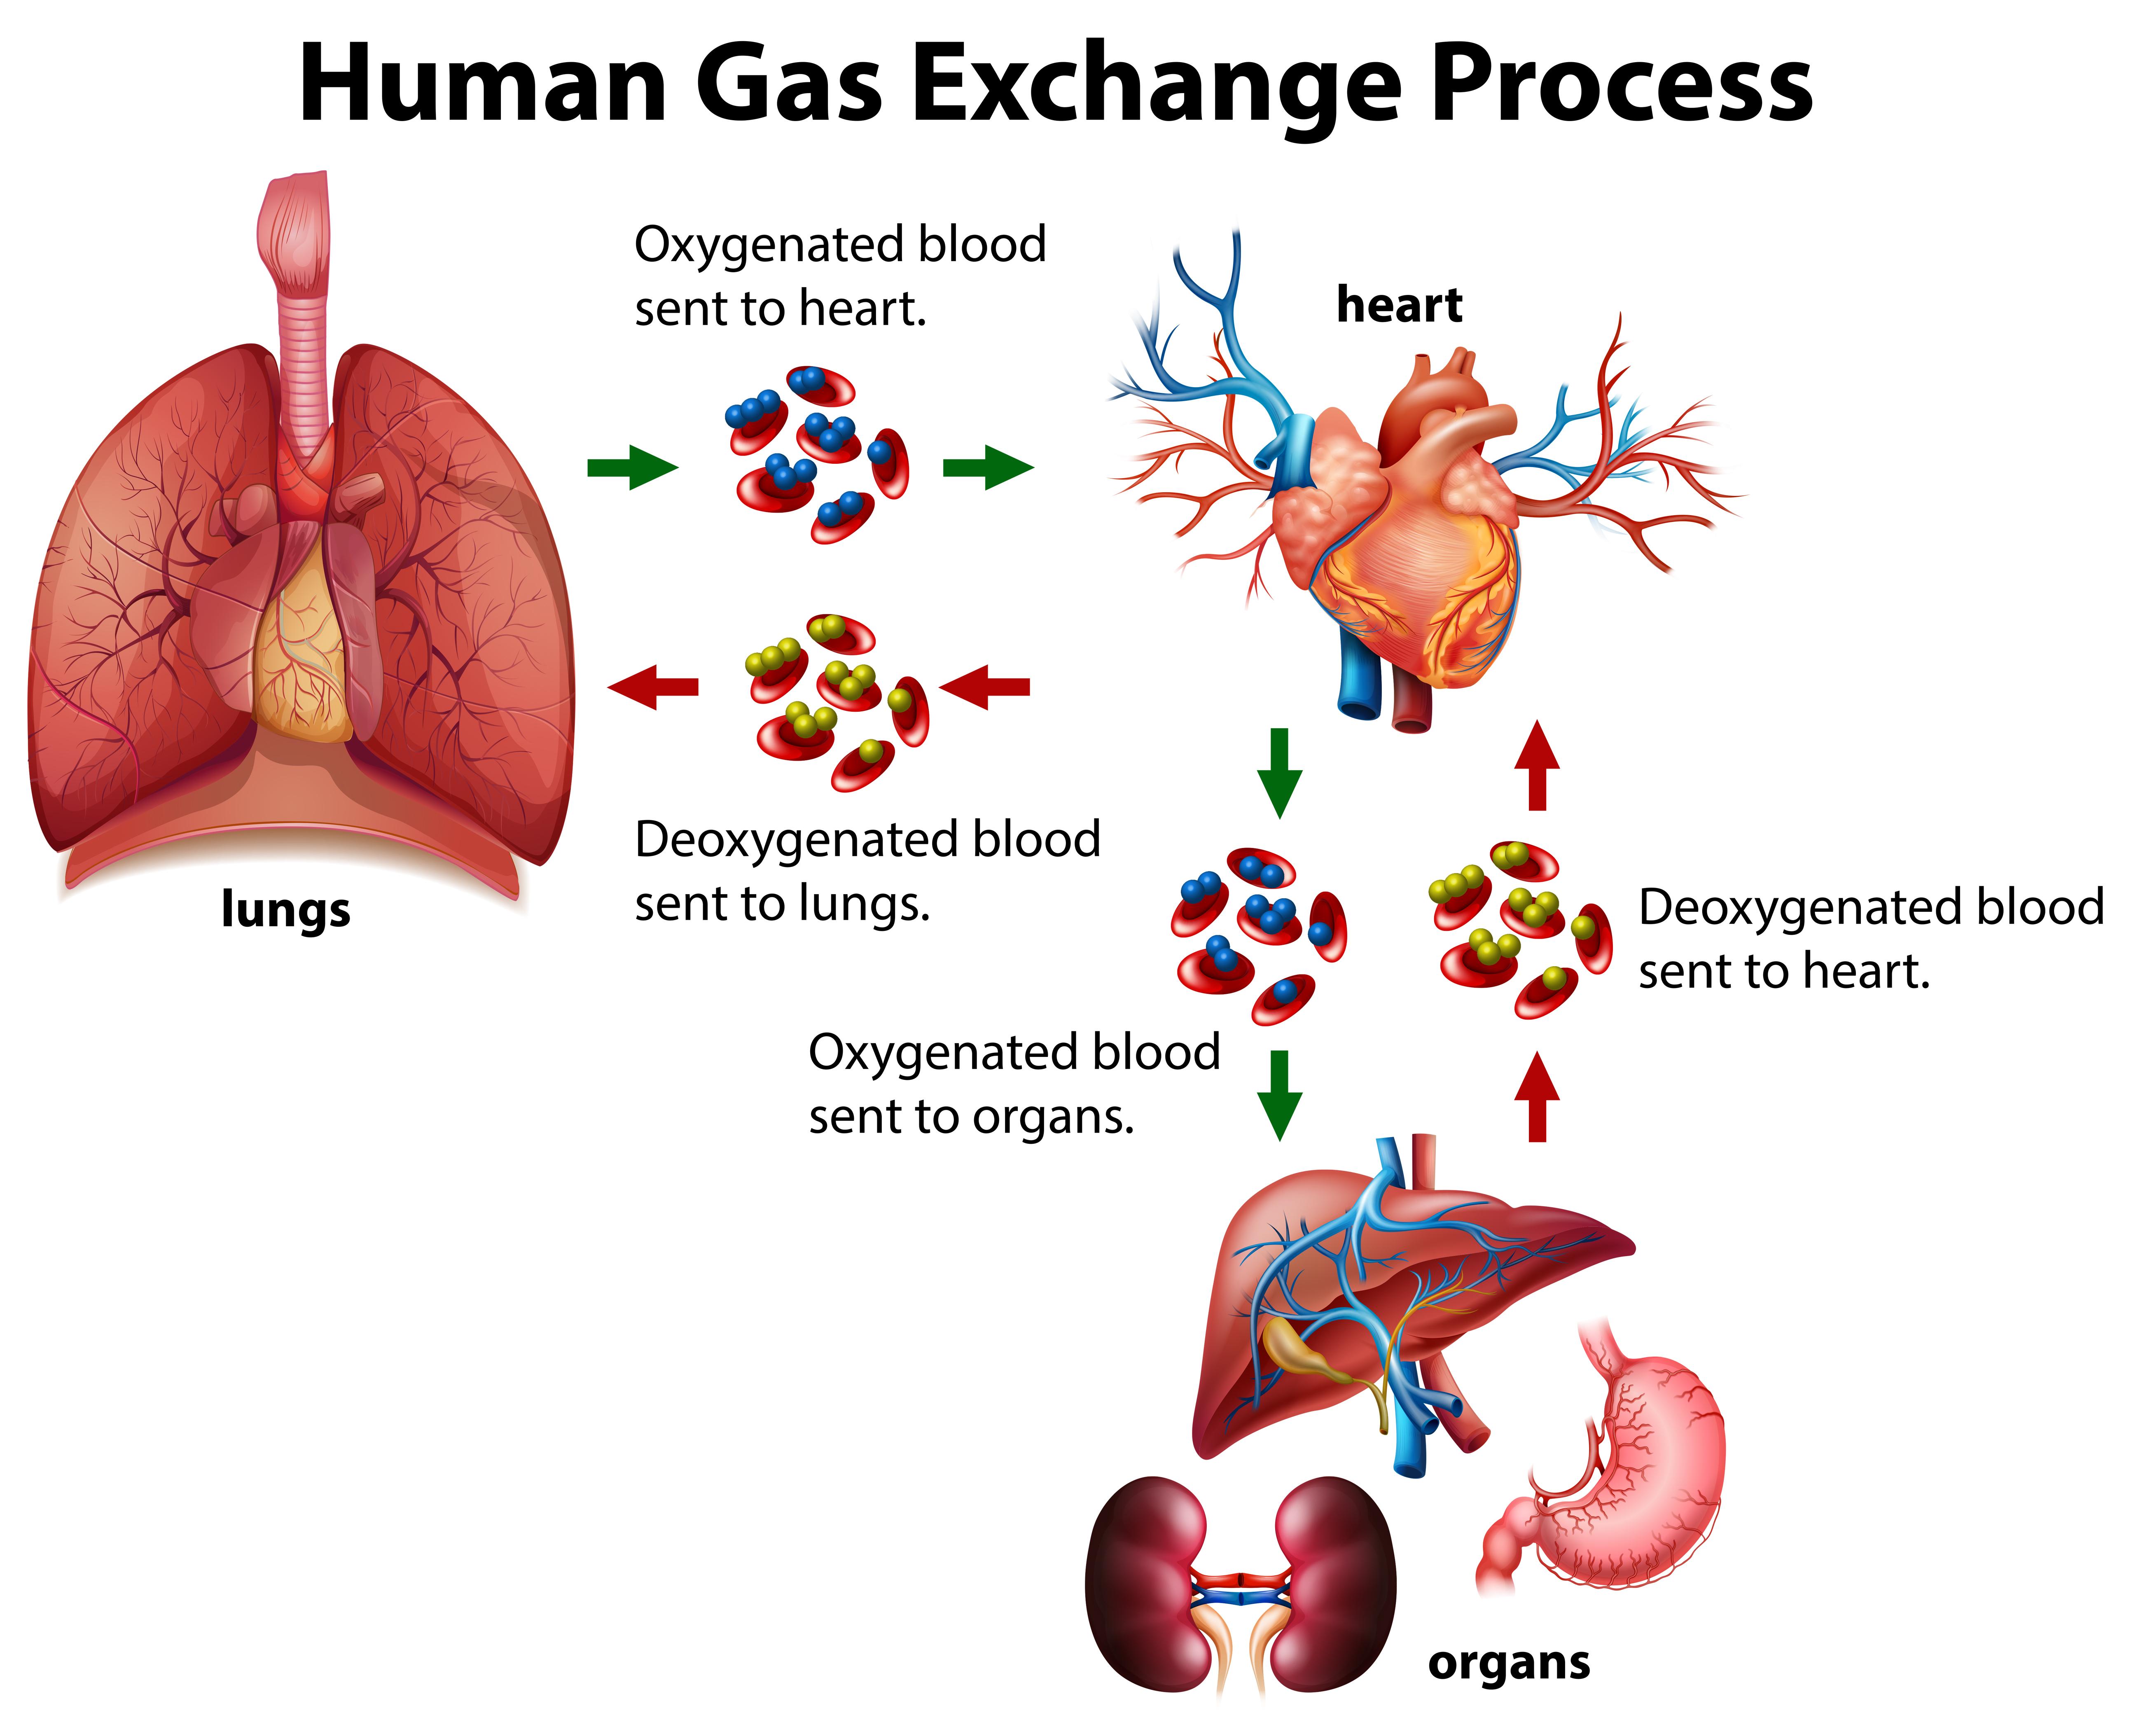 Human Gas Exchange Process Diagram